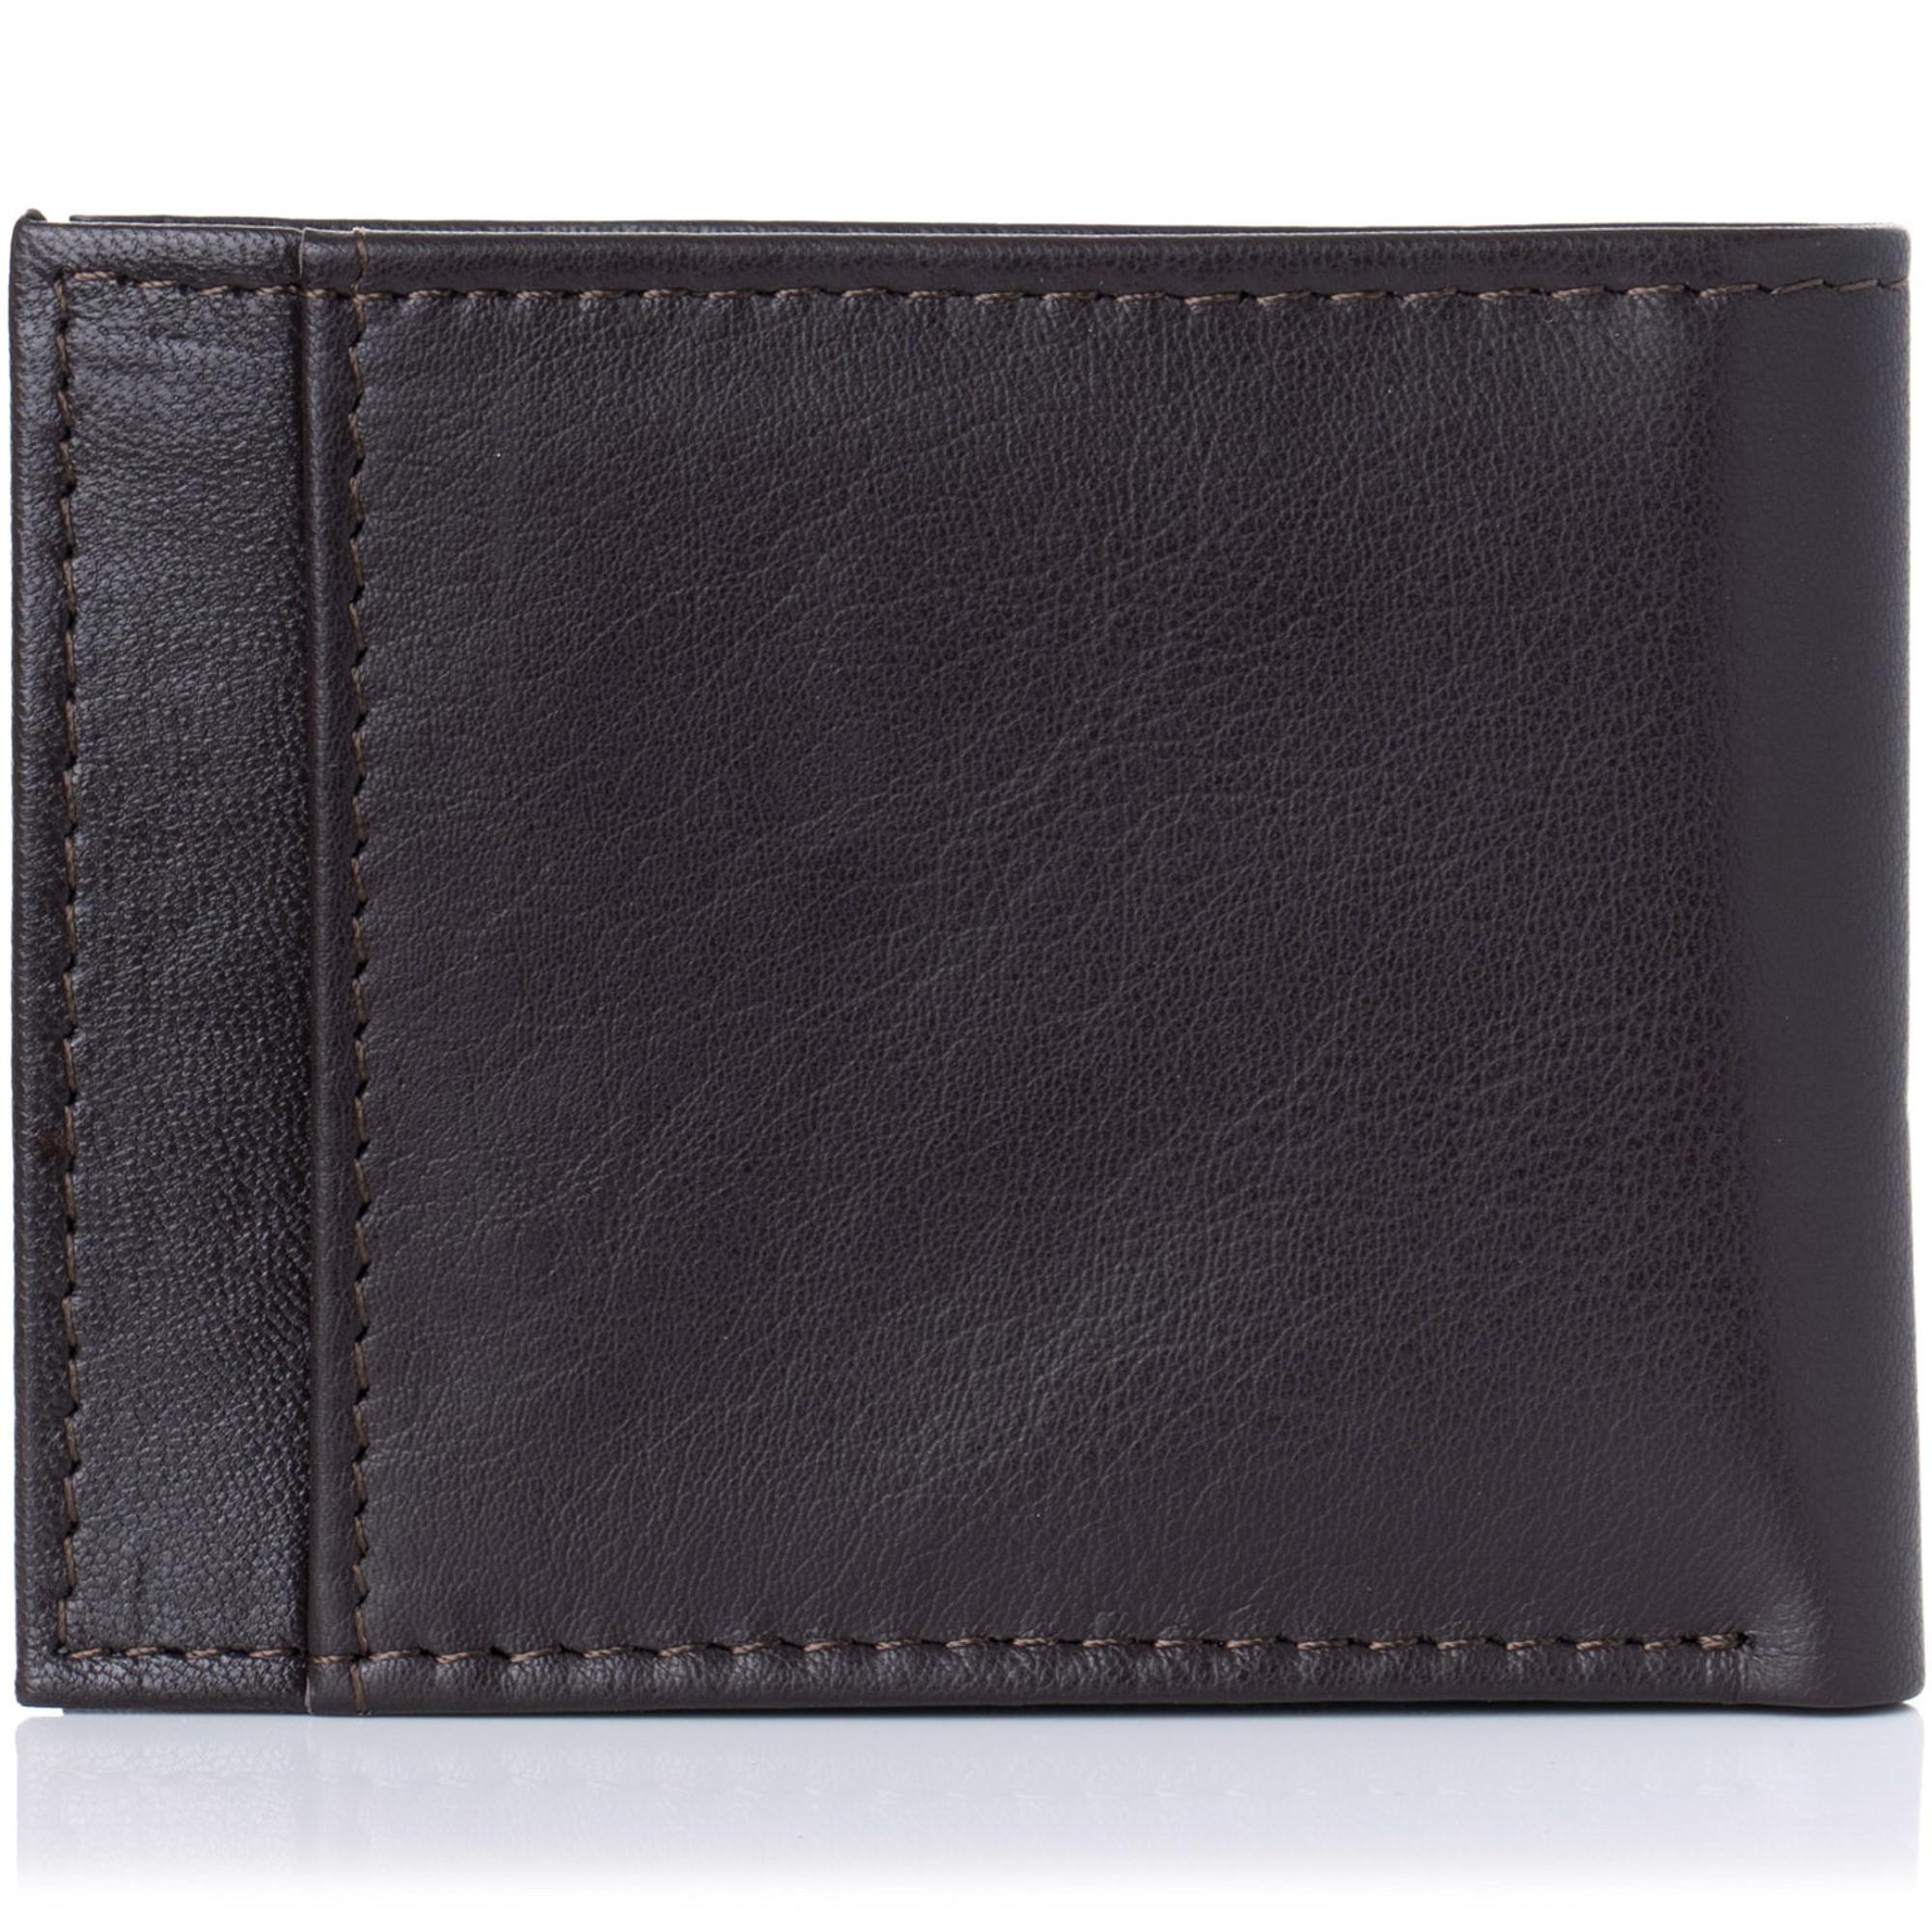 Alpine-Swiss-Mens-Thin-Bifold-Wallet-Top-Grain-Leather-EZ-Access-Outer-Card-Slot thumbnail 39